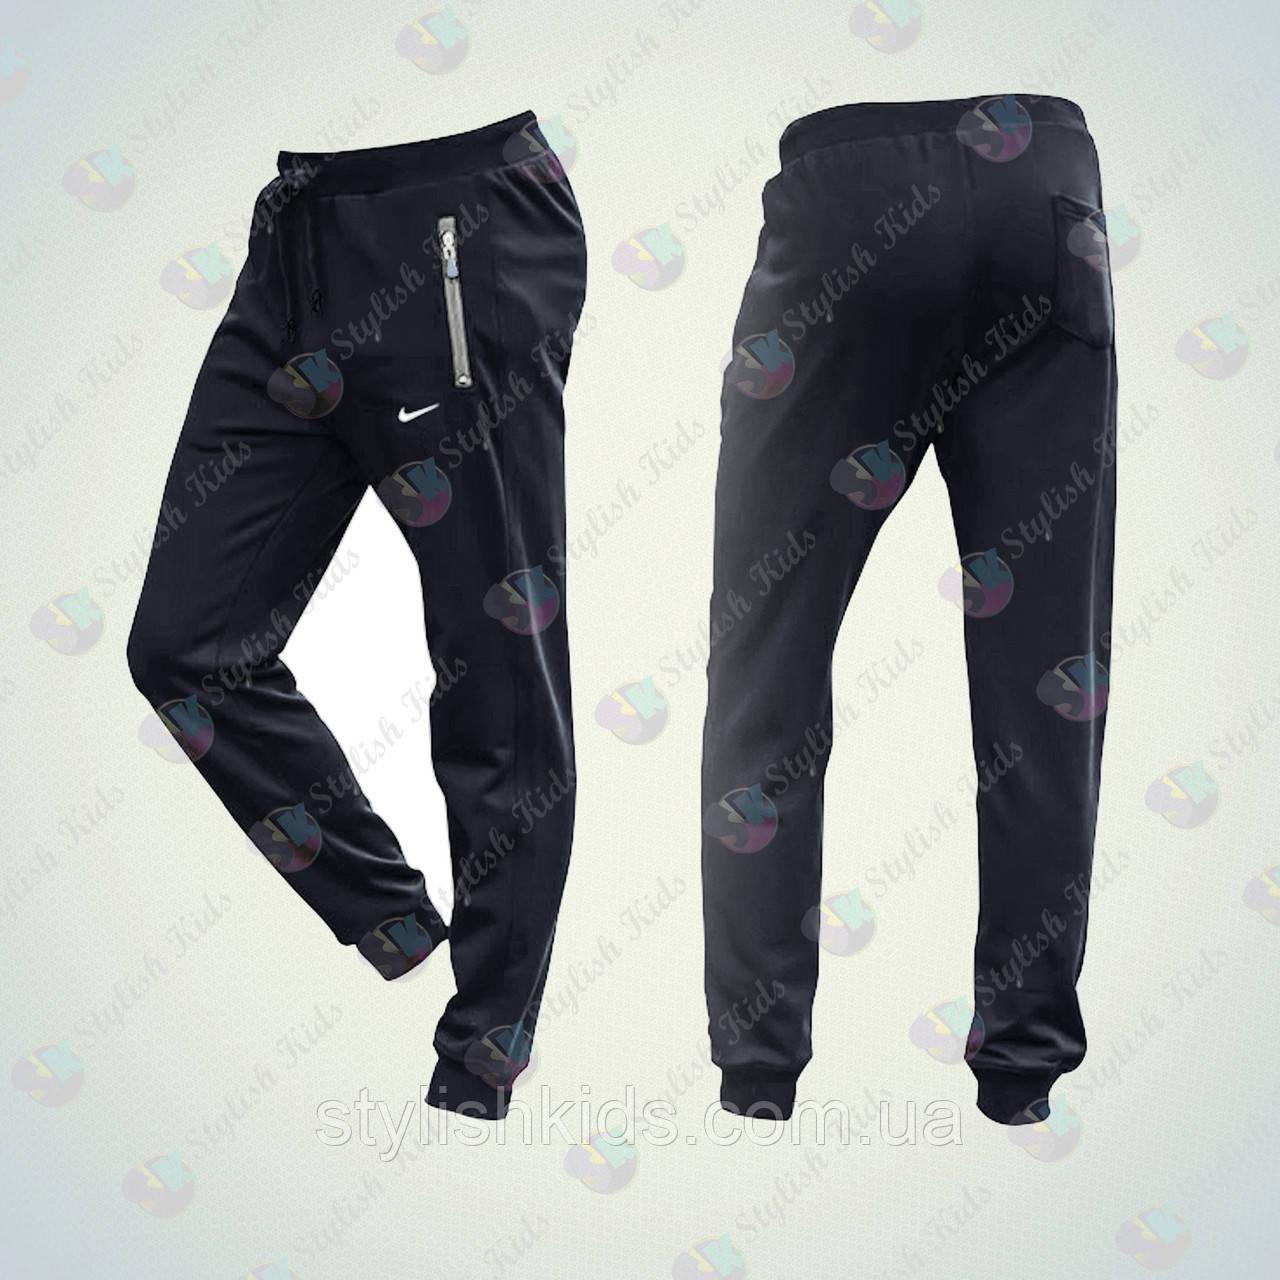 714ace8ce119b6 Спортивные штаны,брюки Nike на мальчика подростка. Спортивные подростковые  штаны,брюки купить в Украине . 164р(M)